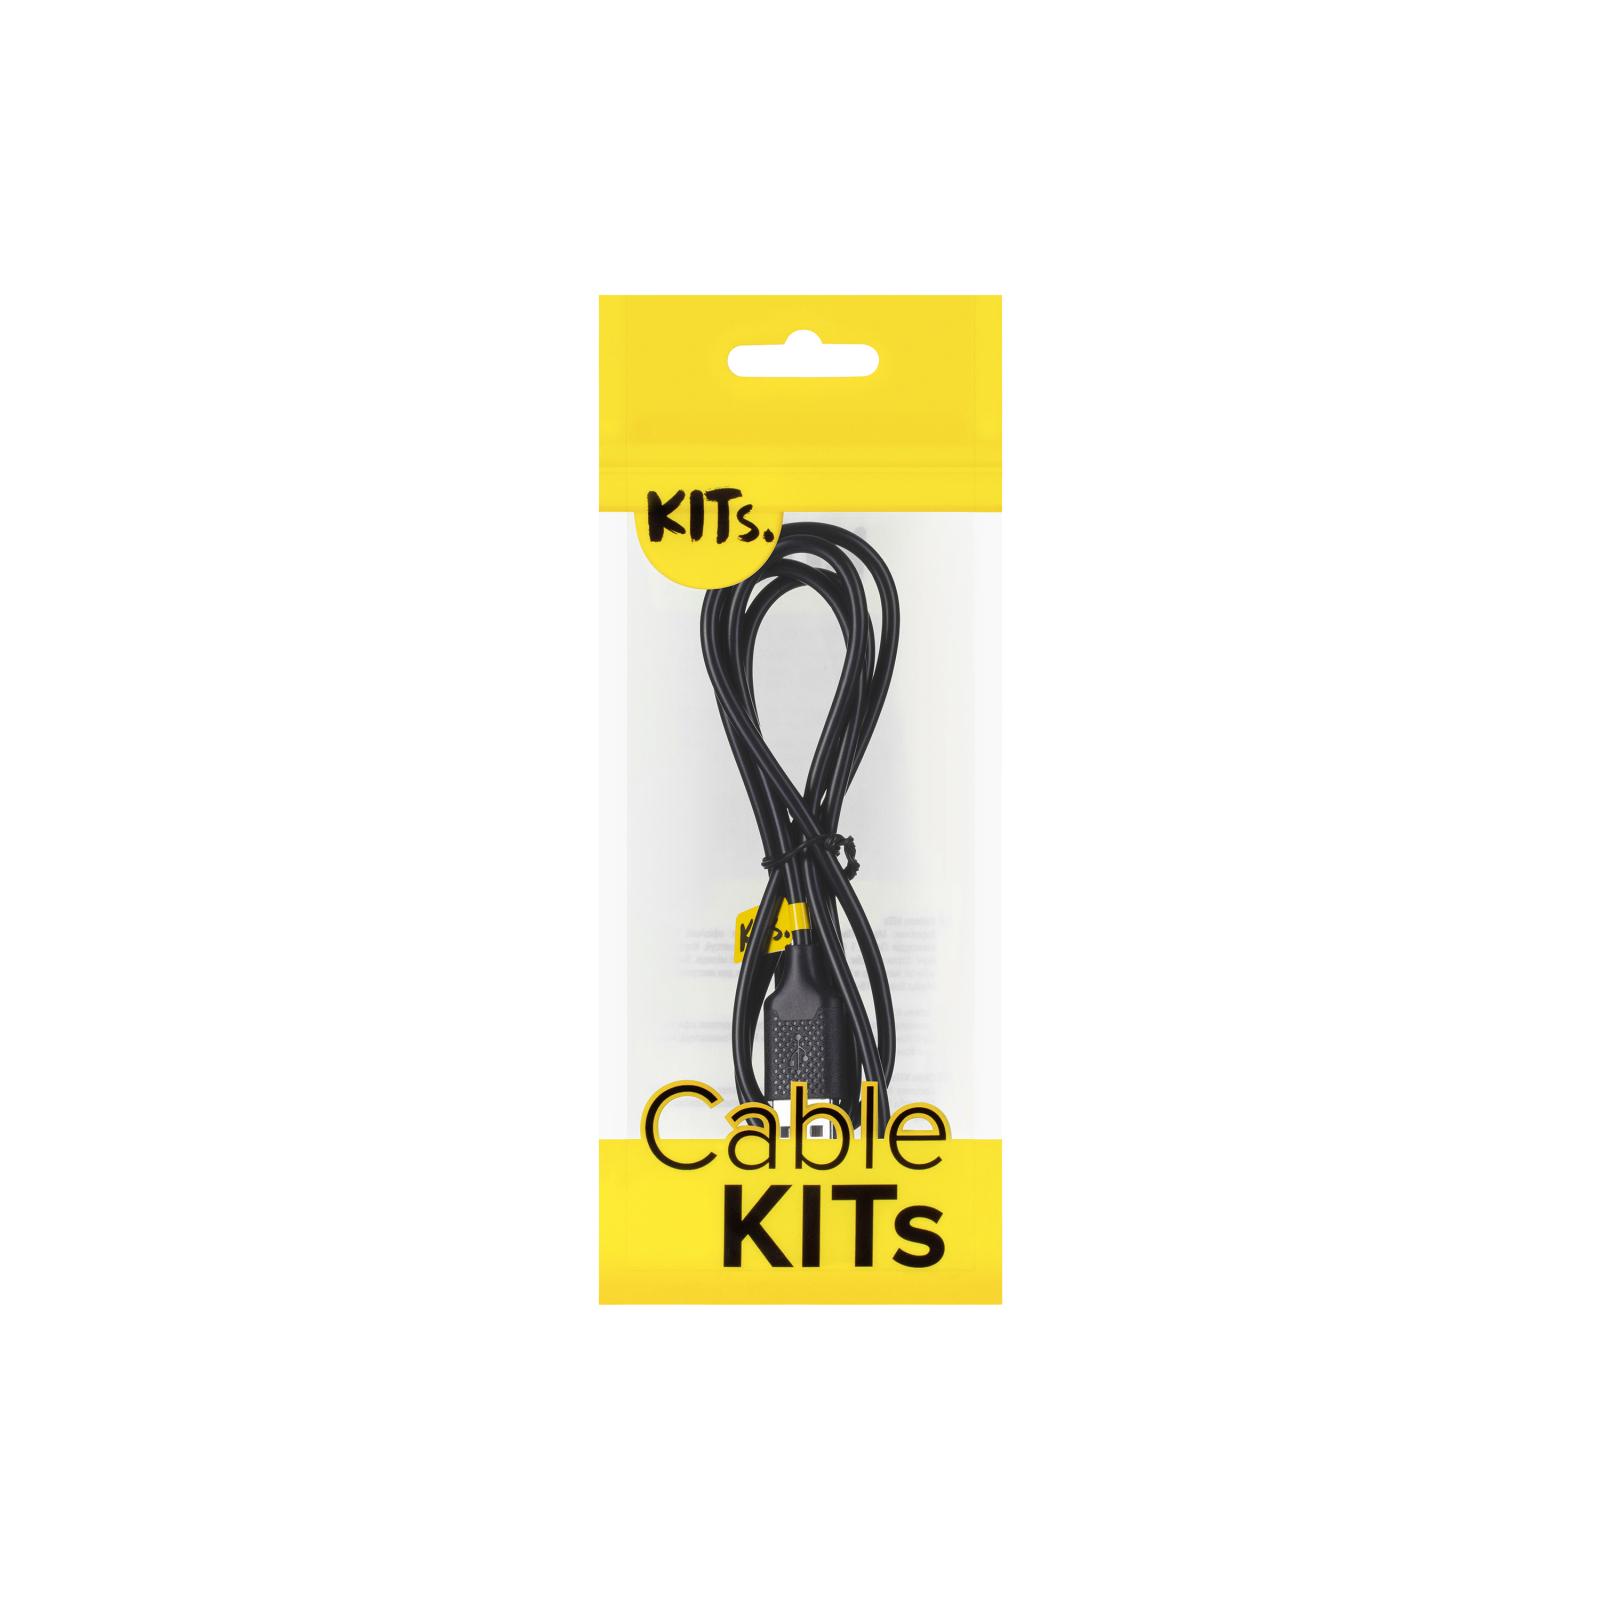 Дата кабель USB 2.0 AM to Lightning 1.0m 2A Kit (KITS-W-003) изображение 3